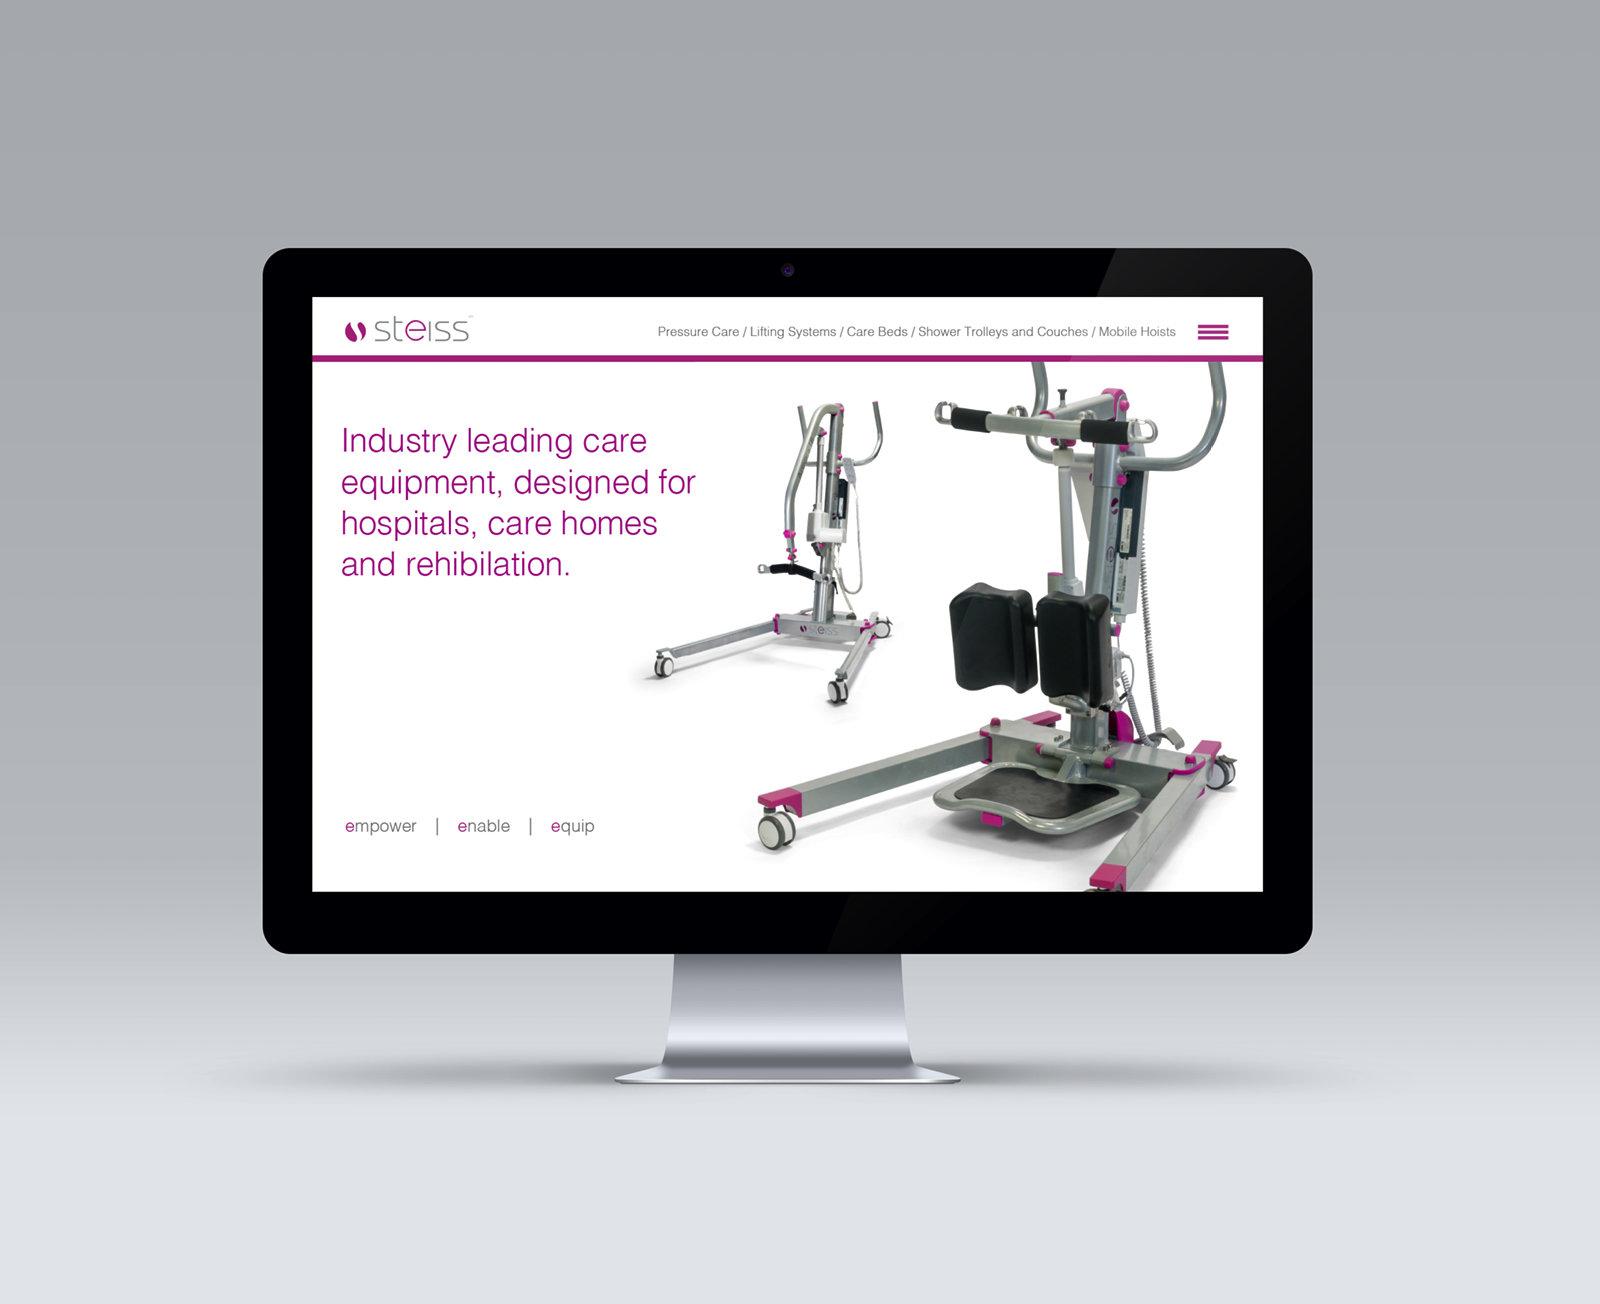 Medical-equipment-healtcare-brand-identity-website-design